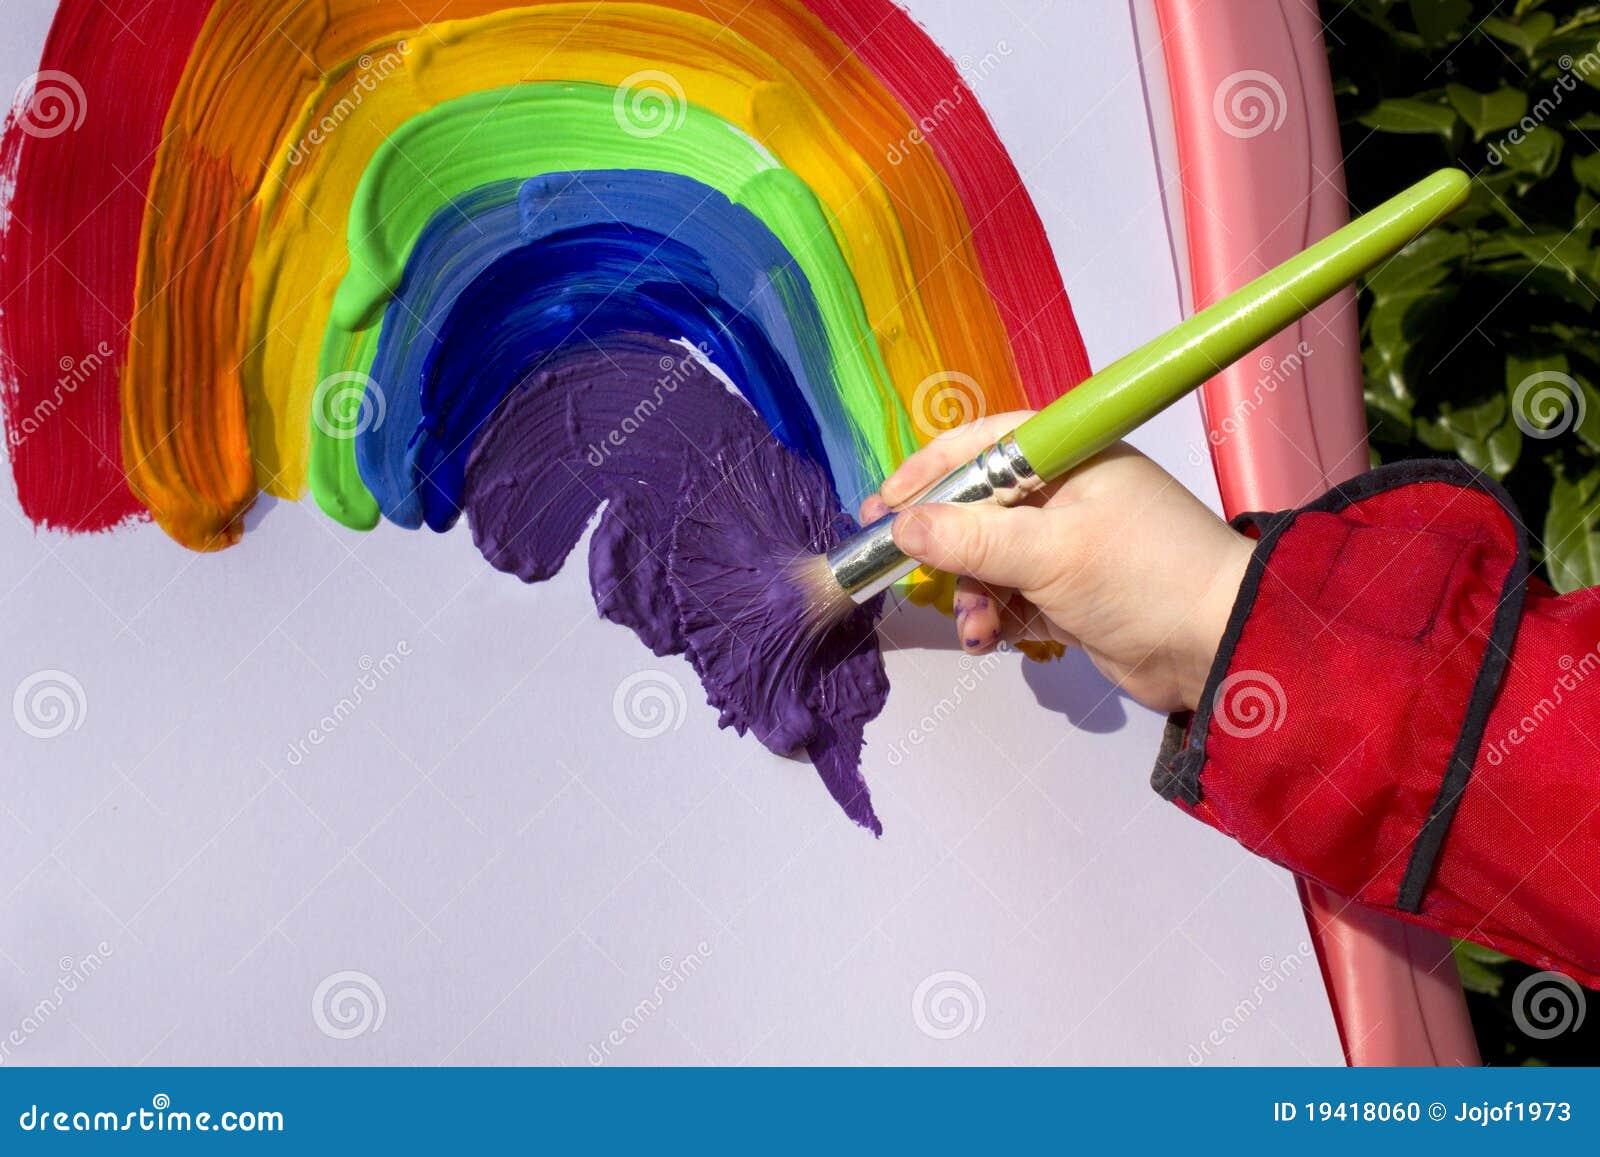 Learn z brush